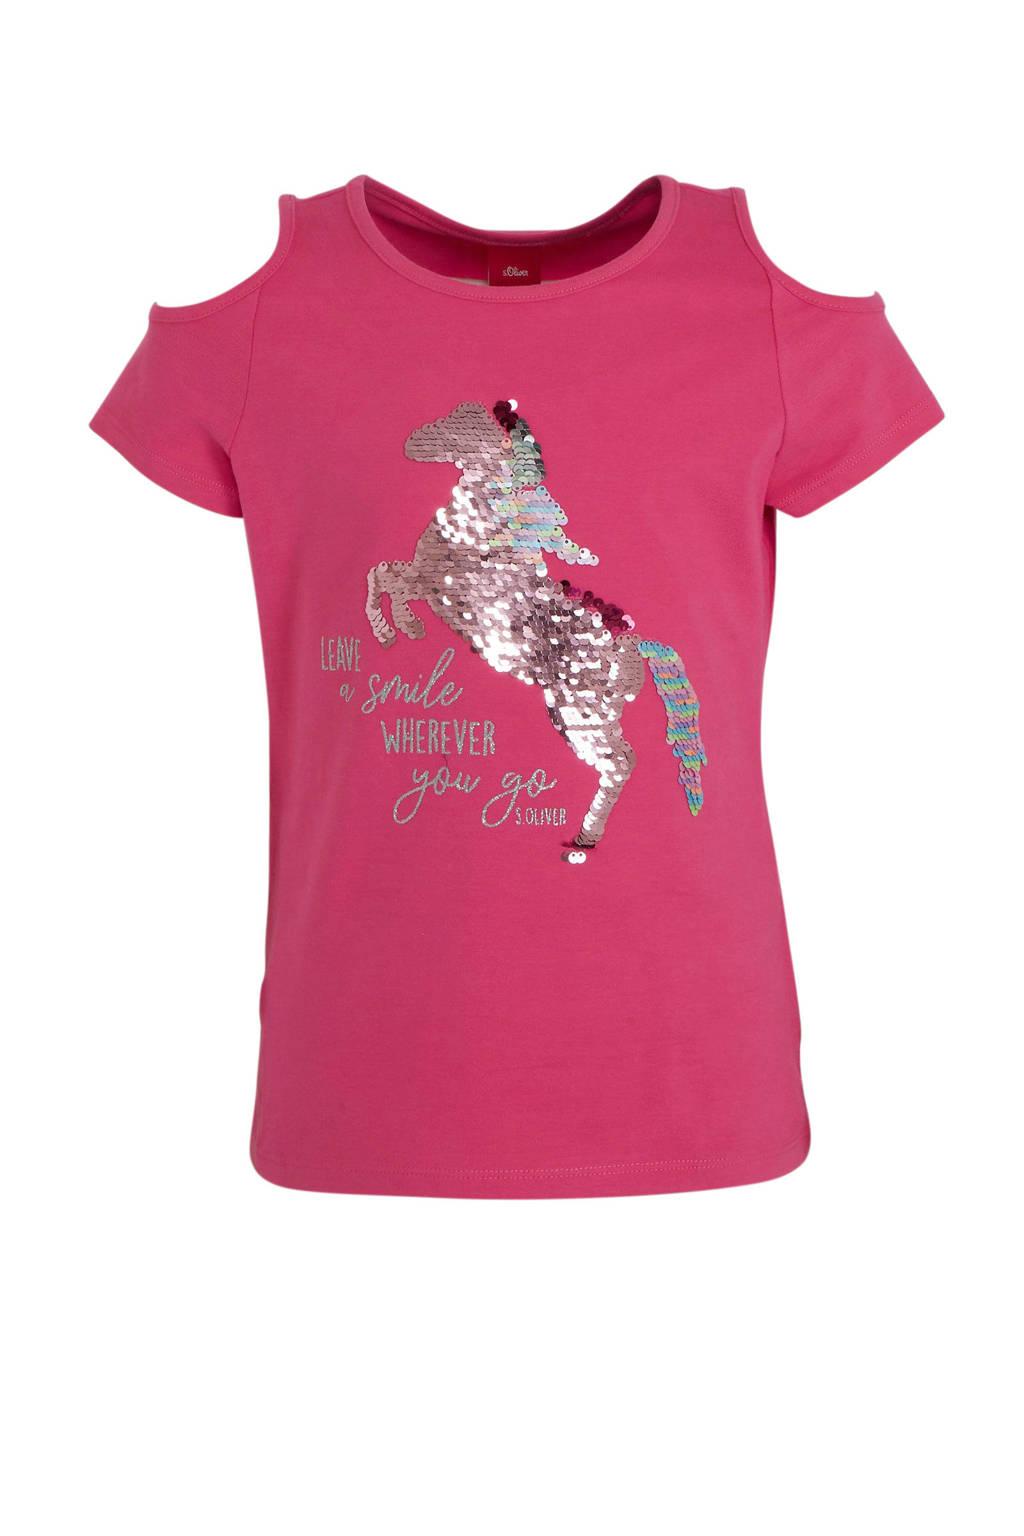 s.Oliver T-shirt met printopdruk en pailletten roze, Roze